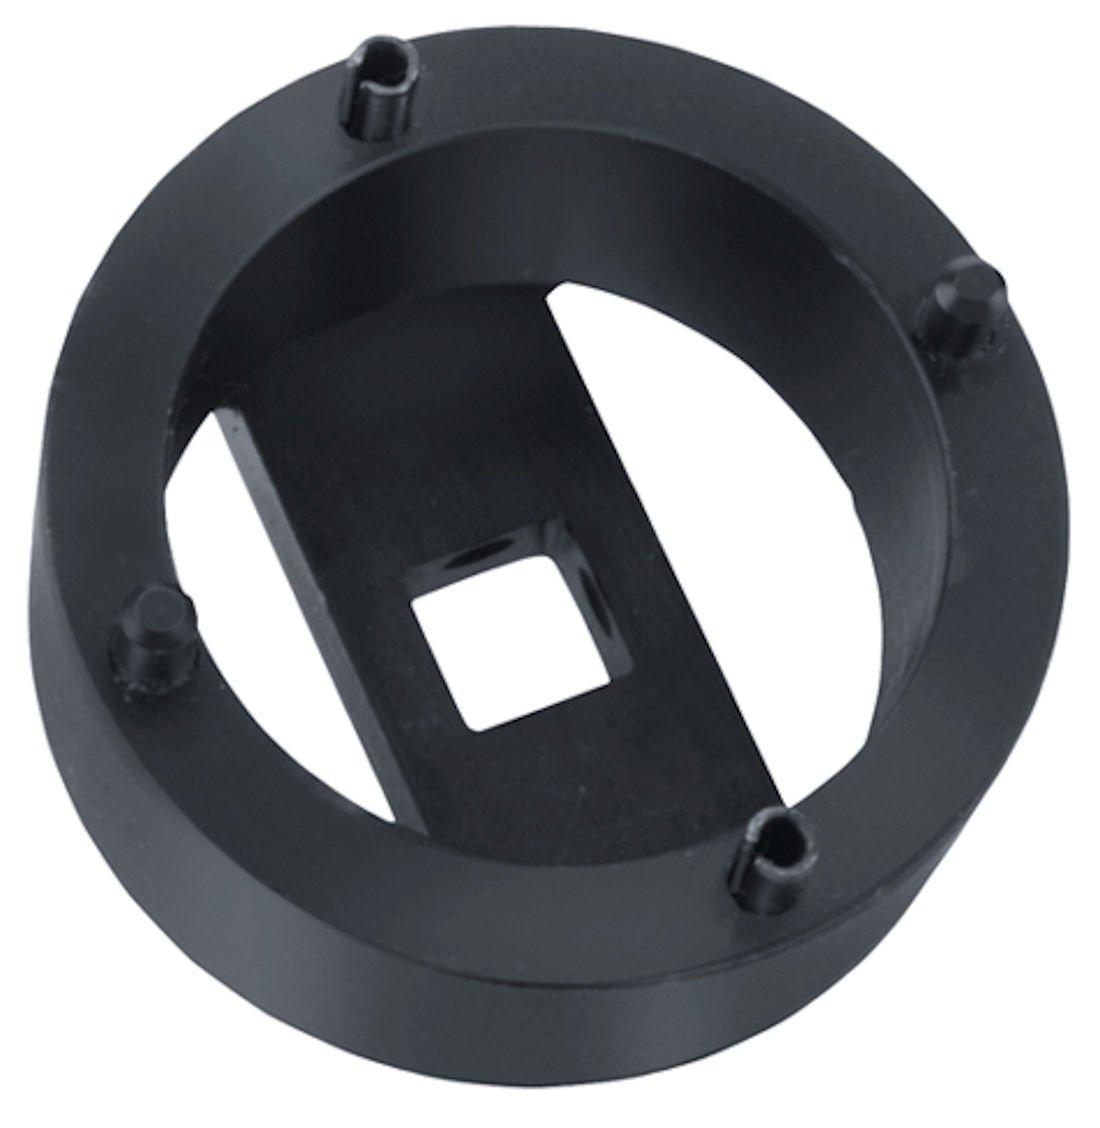 OTC 7941 Hub Locknut Socket Wrench for Toyota